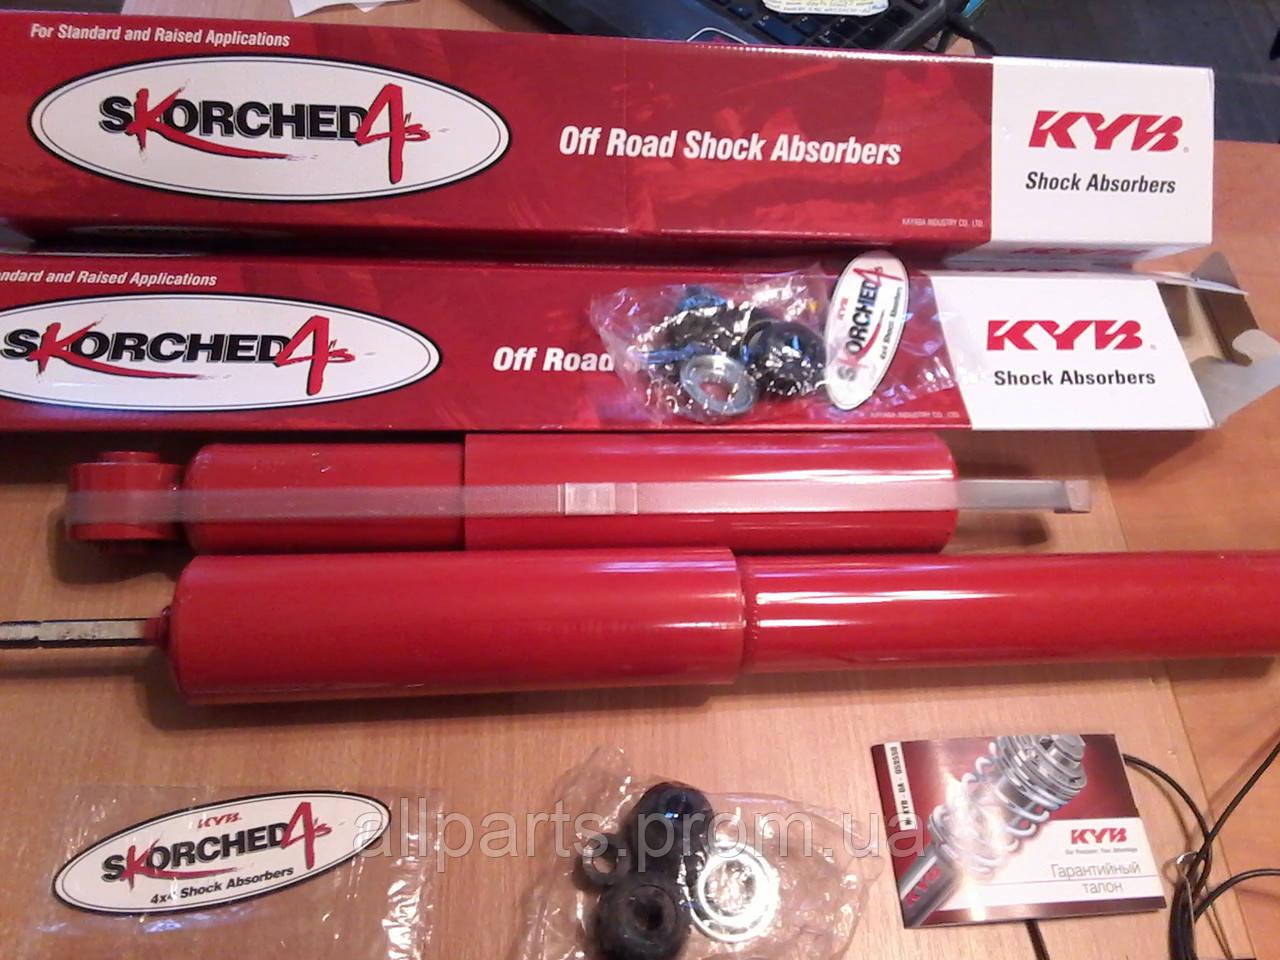 Амортизаторы KYB Skorched4's на Toyota Prado 120  задние (номер Kayaba 845022)